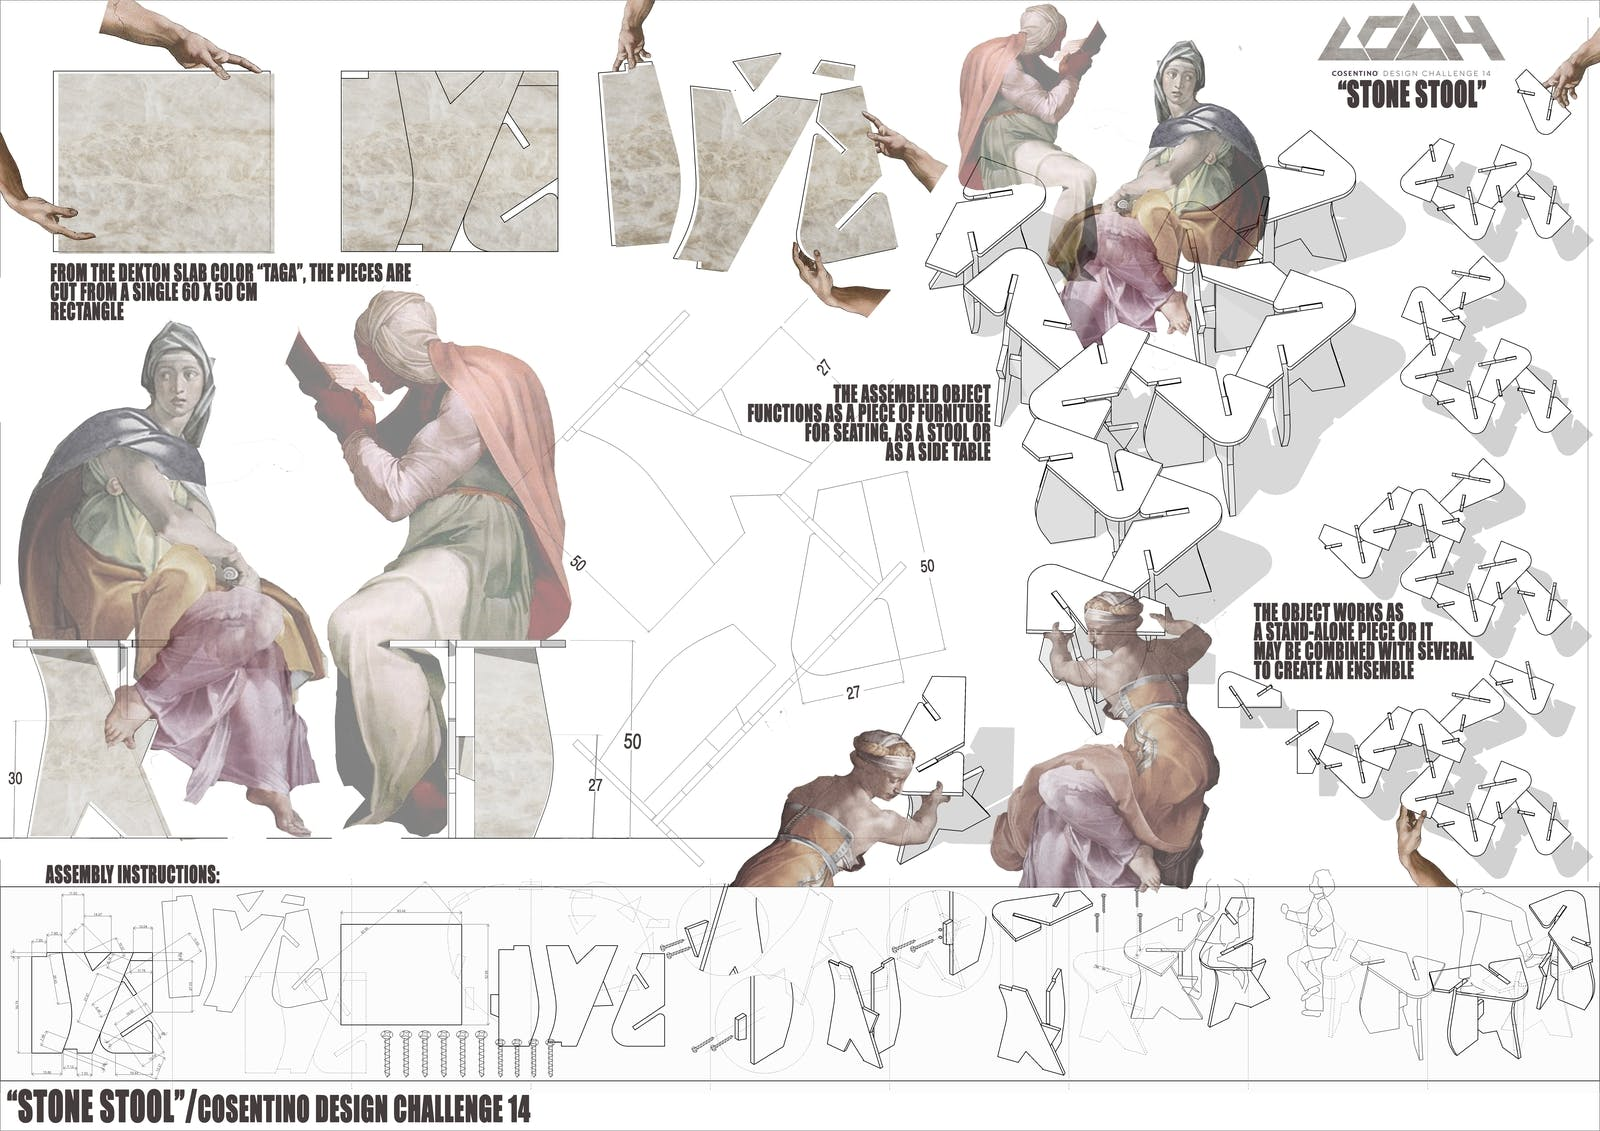 Image of 054 STONE STOOL s 1 in Ganadores Cosentino Design Challenge 14 - Cosentino